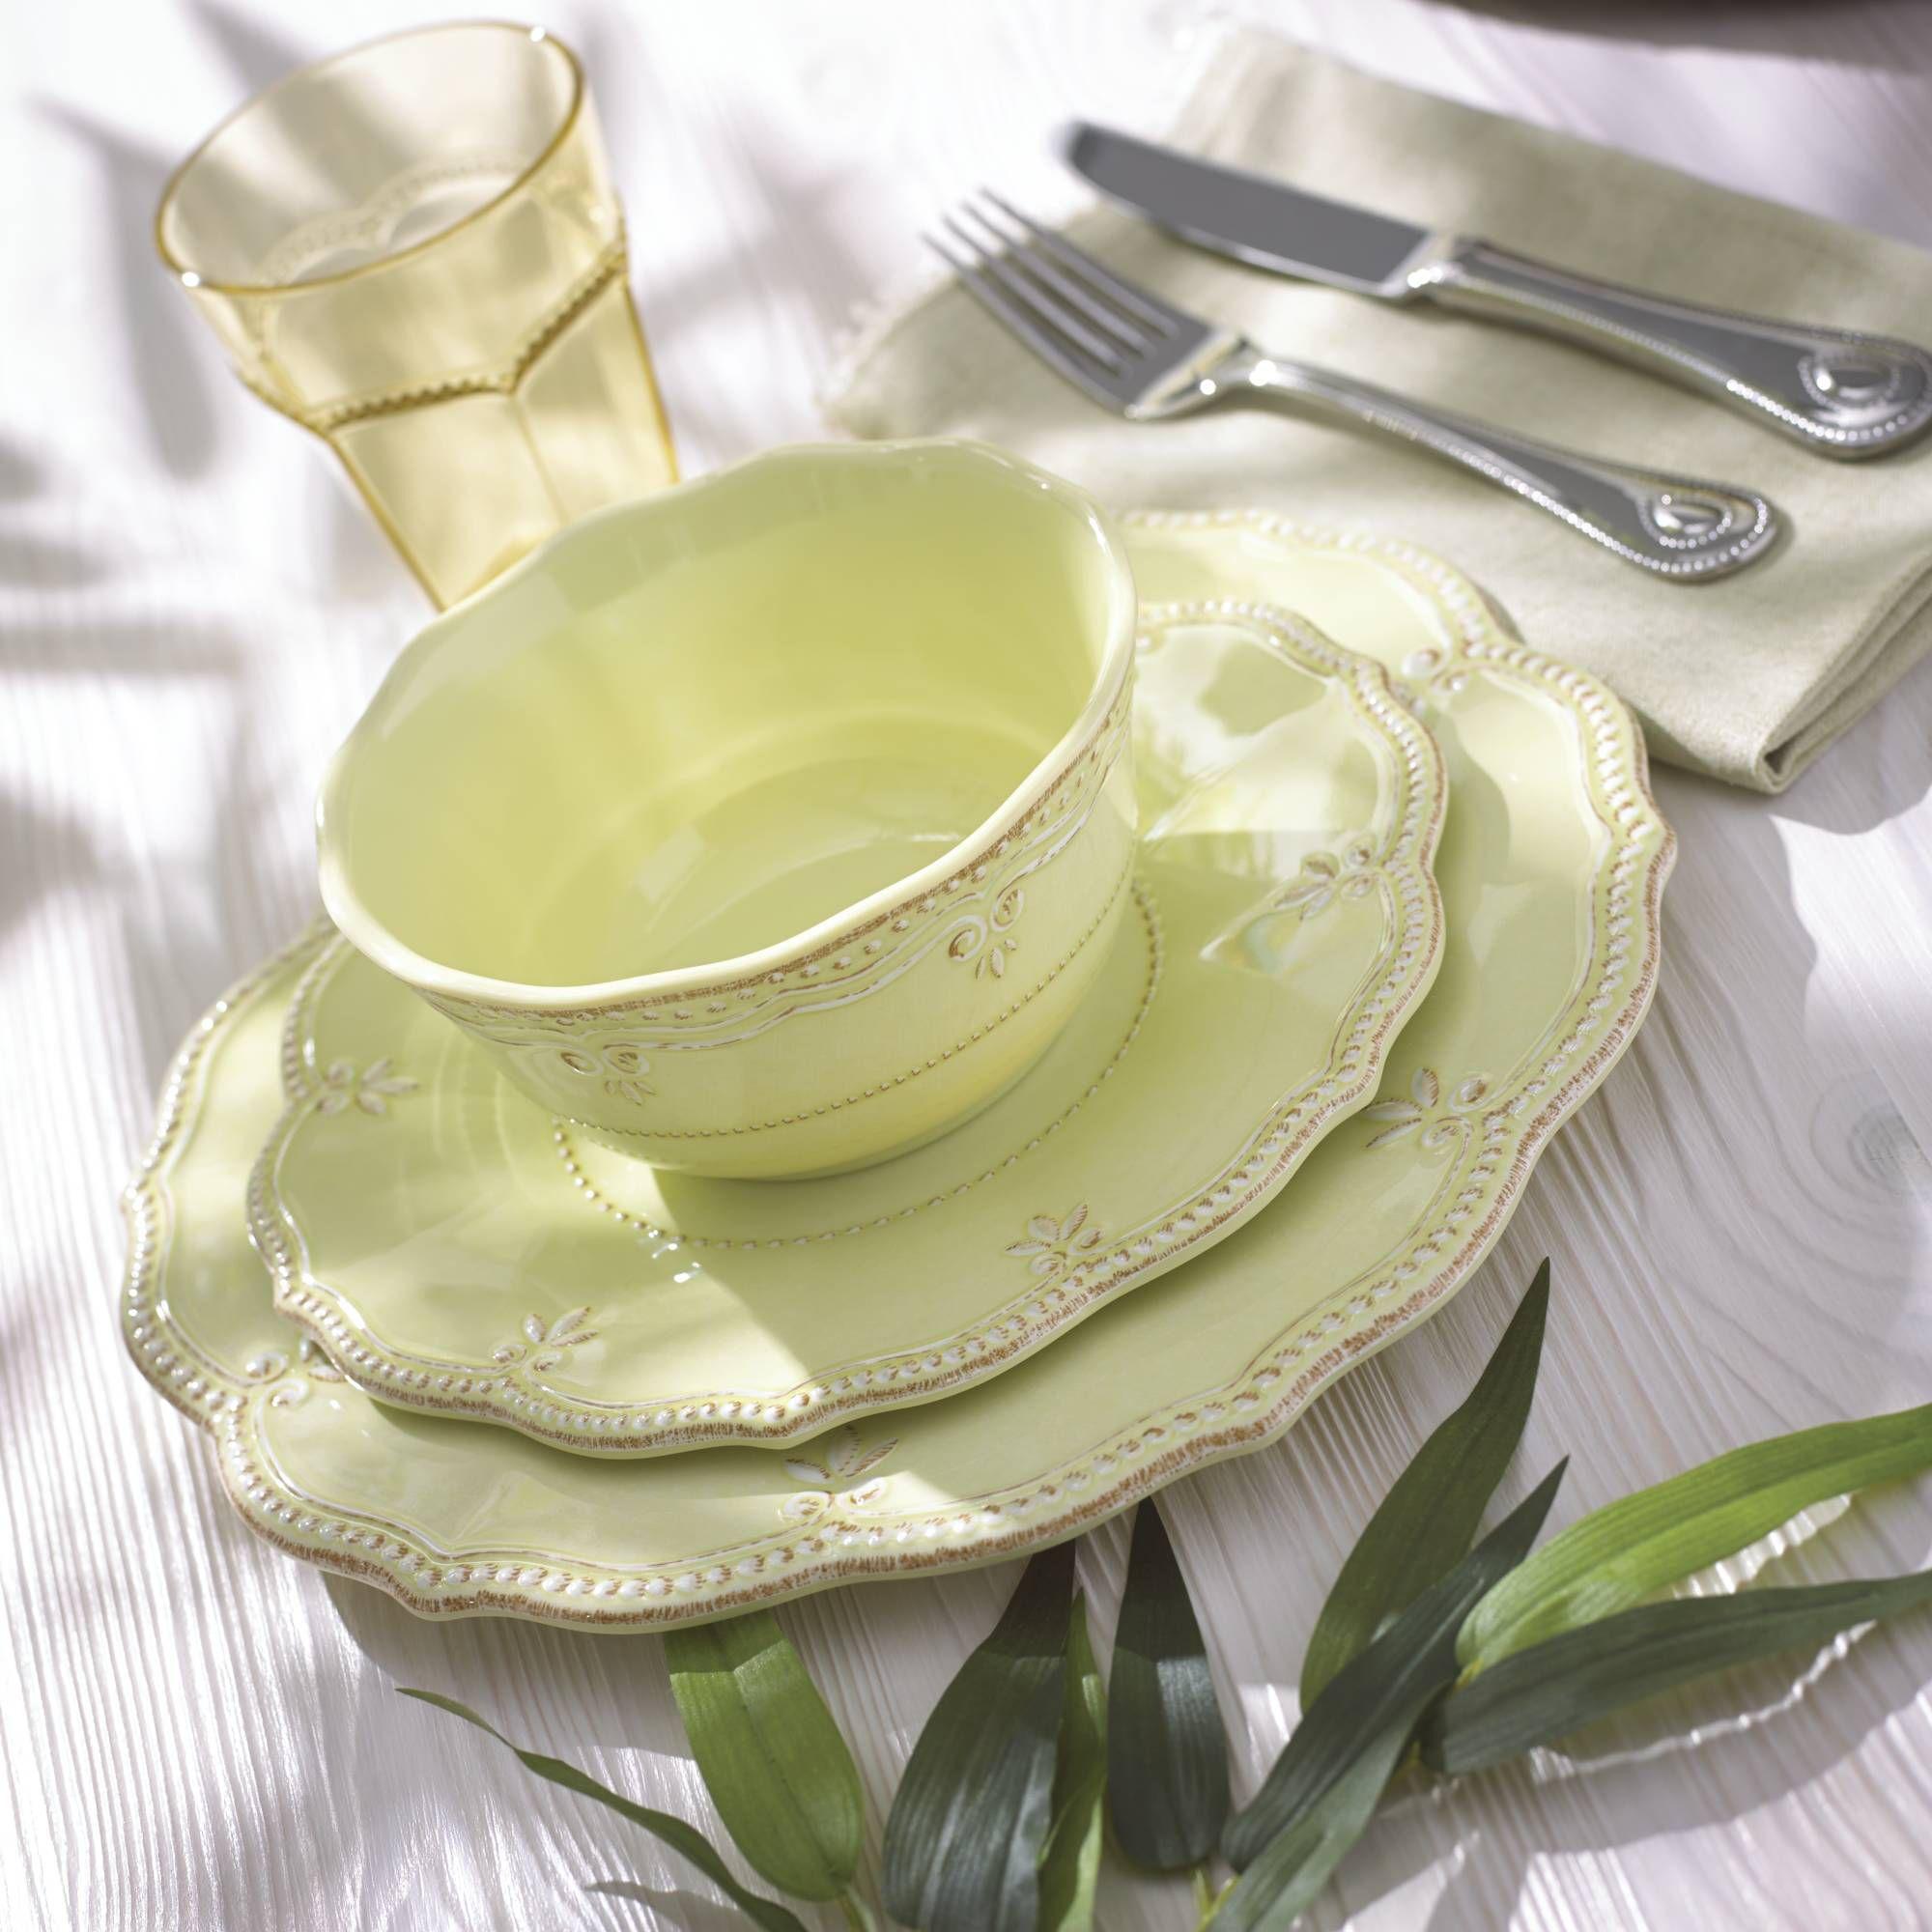 Lenox \u0026quot;French Perle\u0026quot; Kiwi Melamine Dinnerware   default & Lenox \